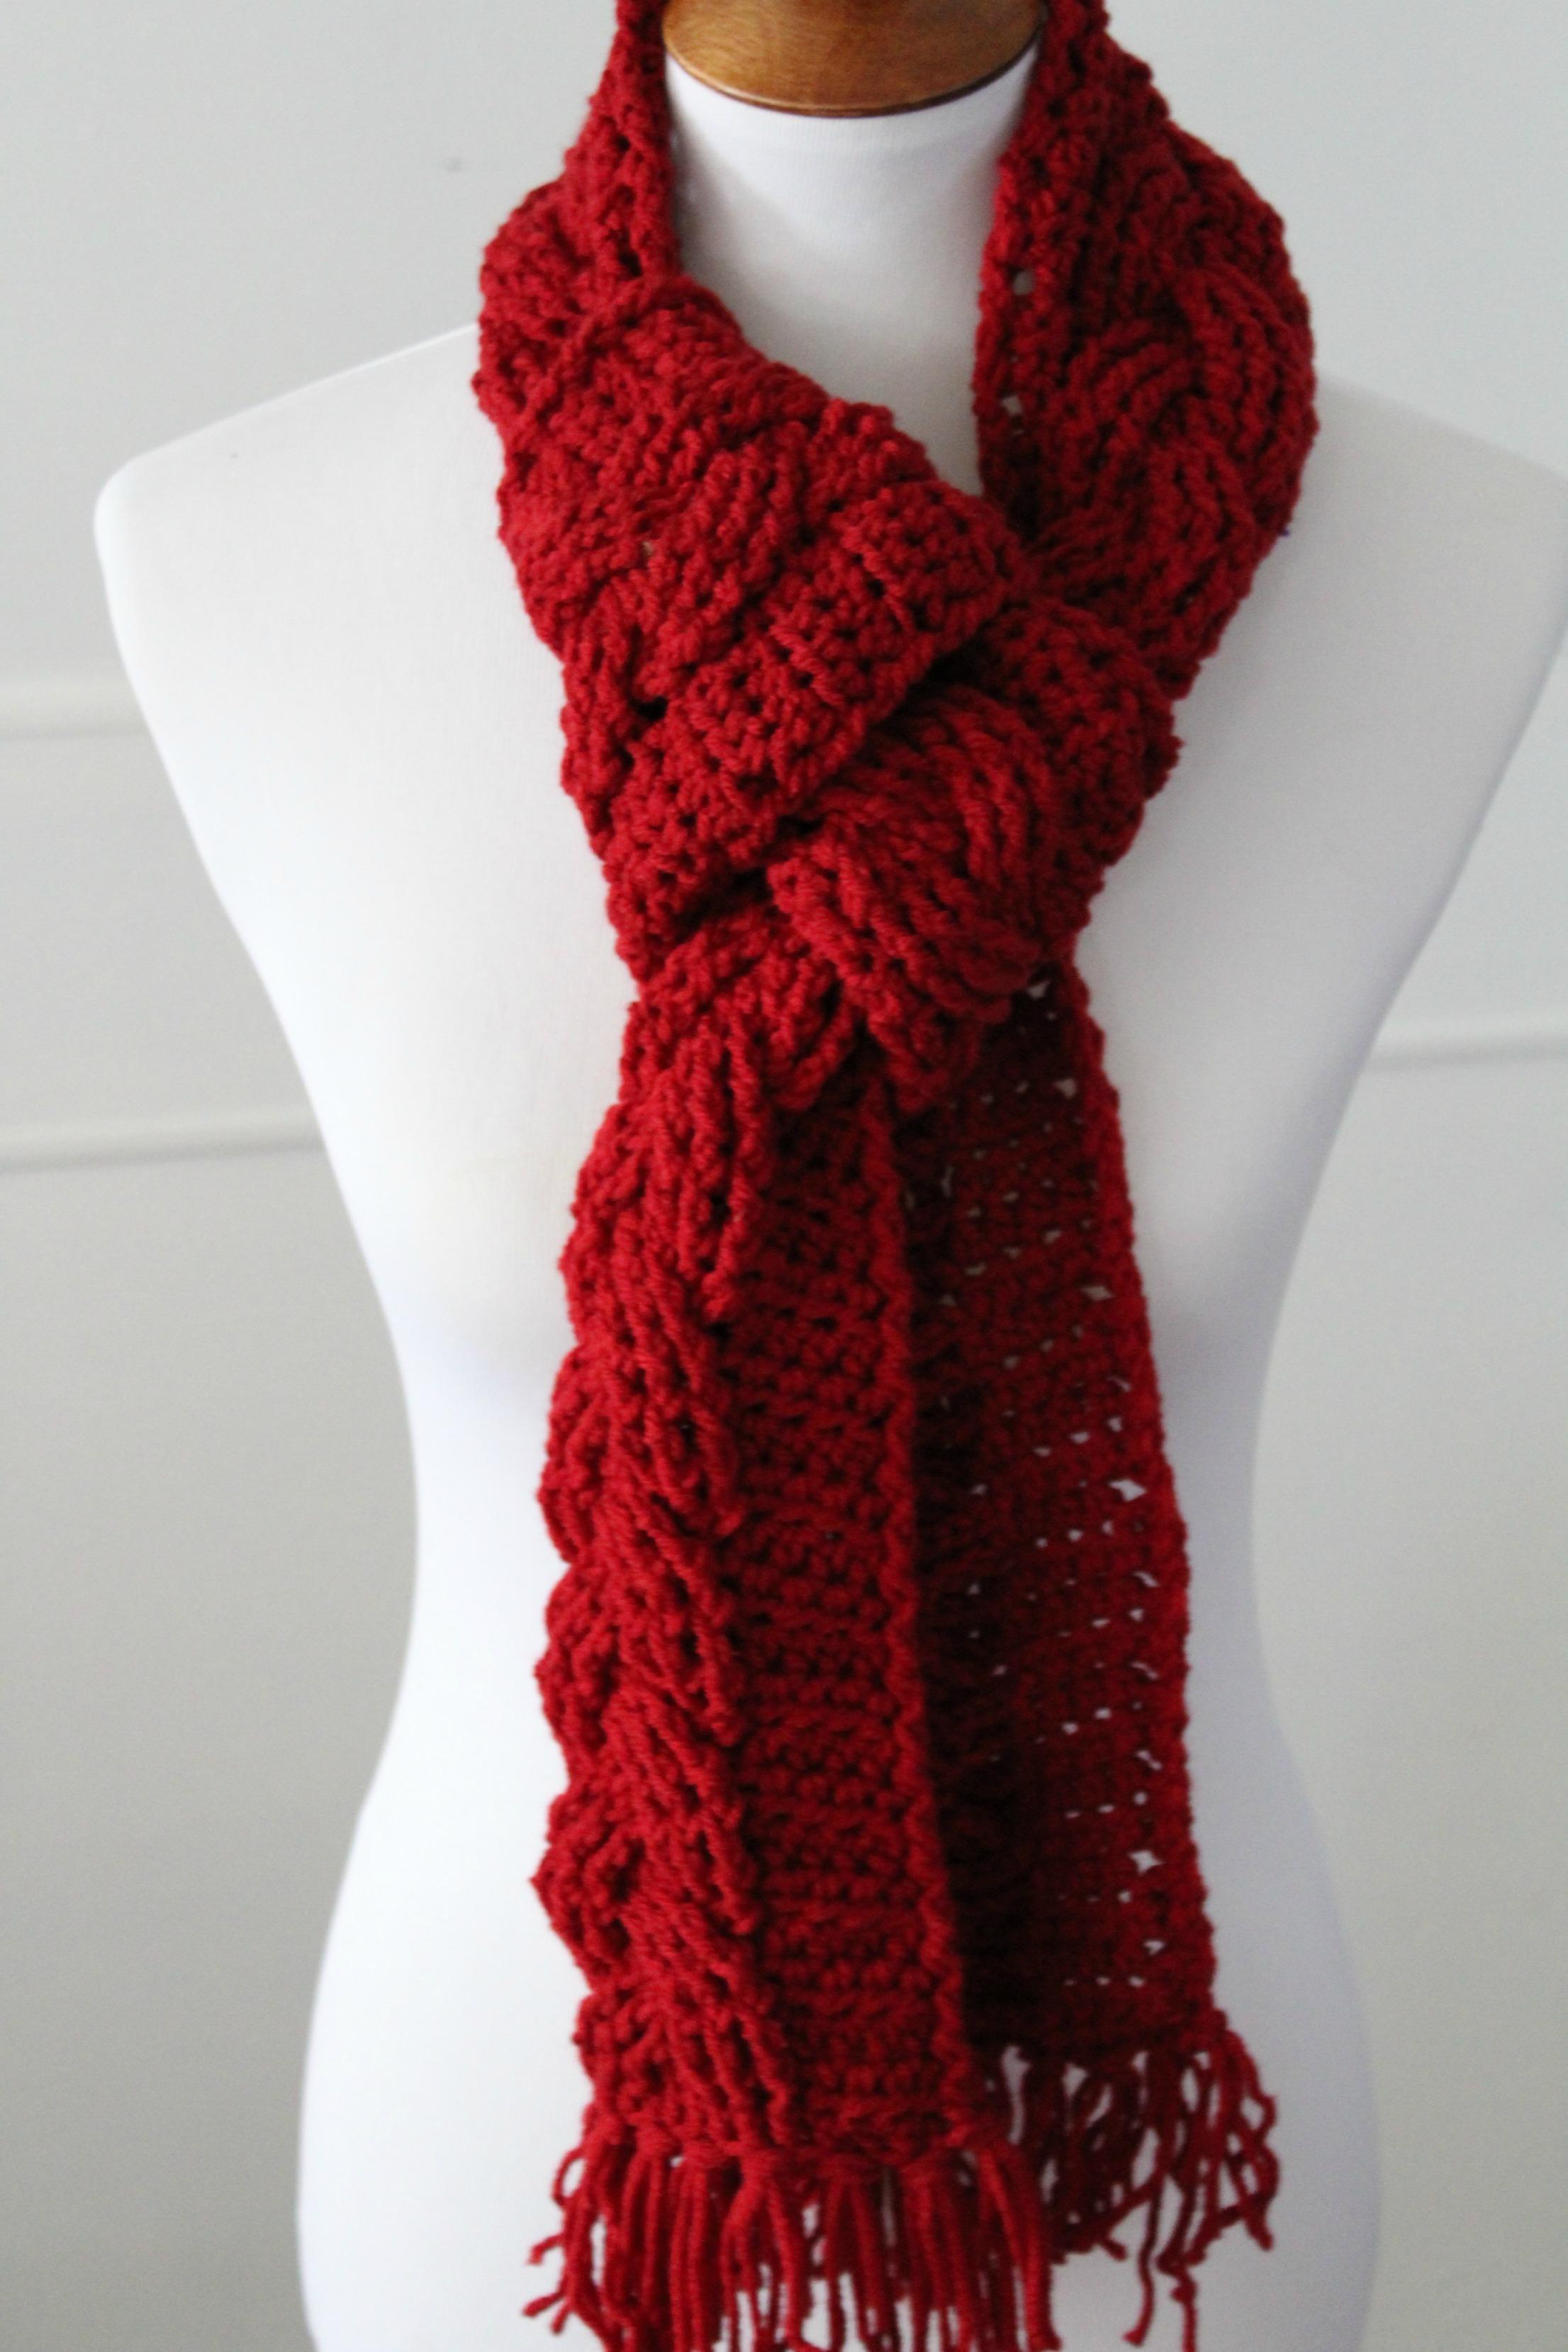 Crochet Cable Scarf Using One Skein of Yarn! - YarnHookNeedles